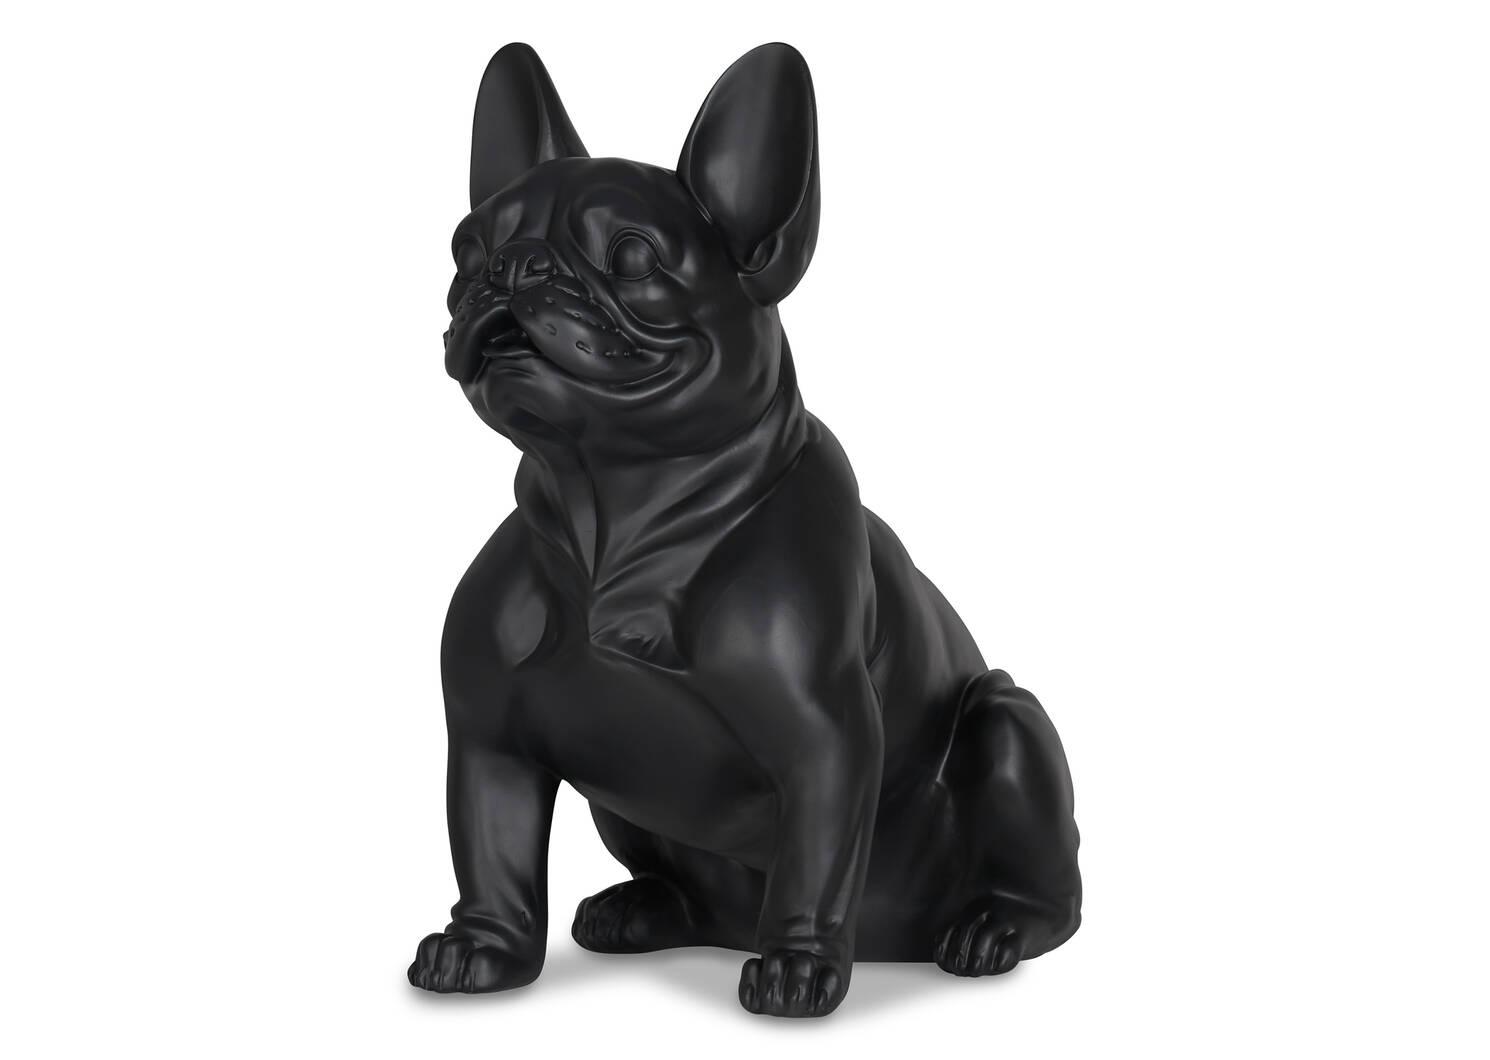 Ripley French Bulldog Statue Black